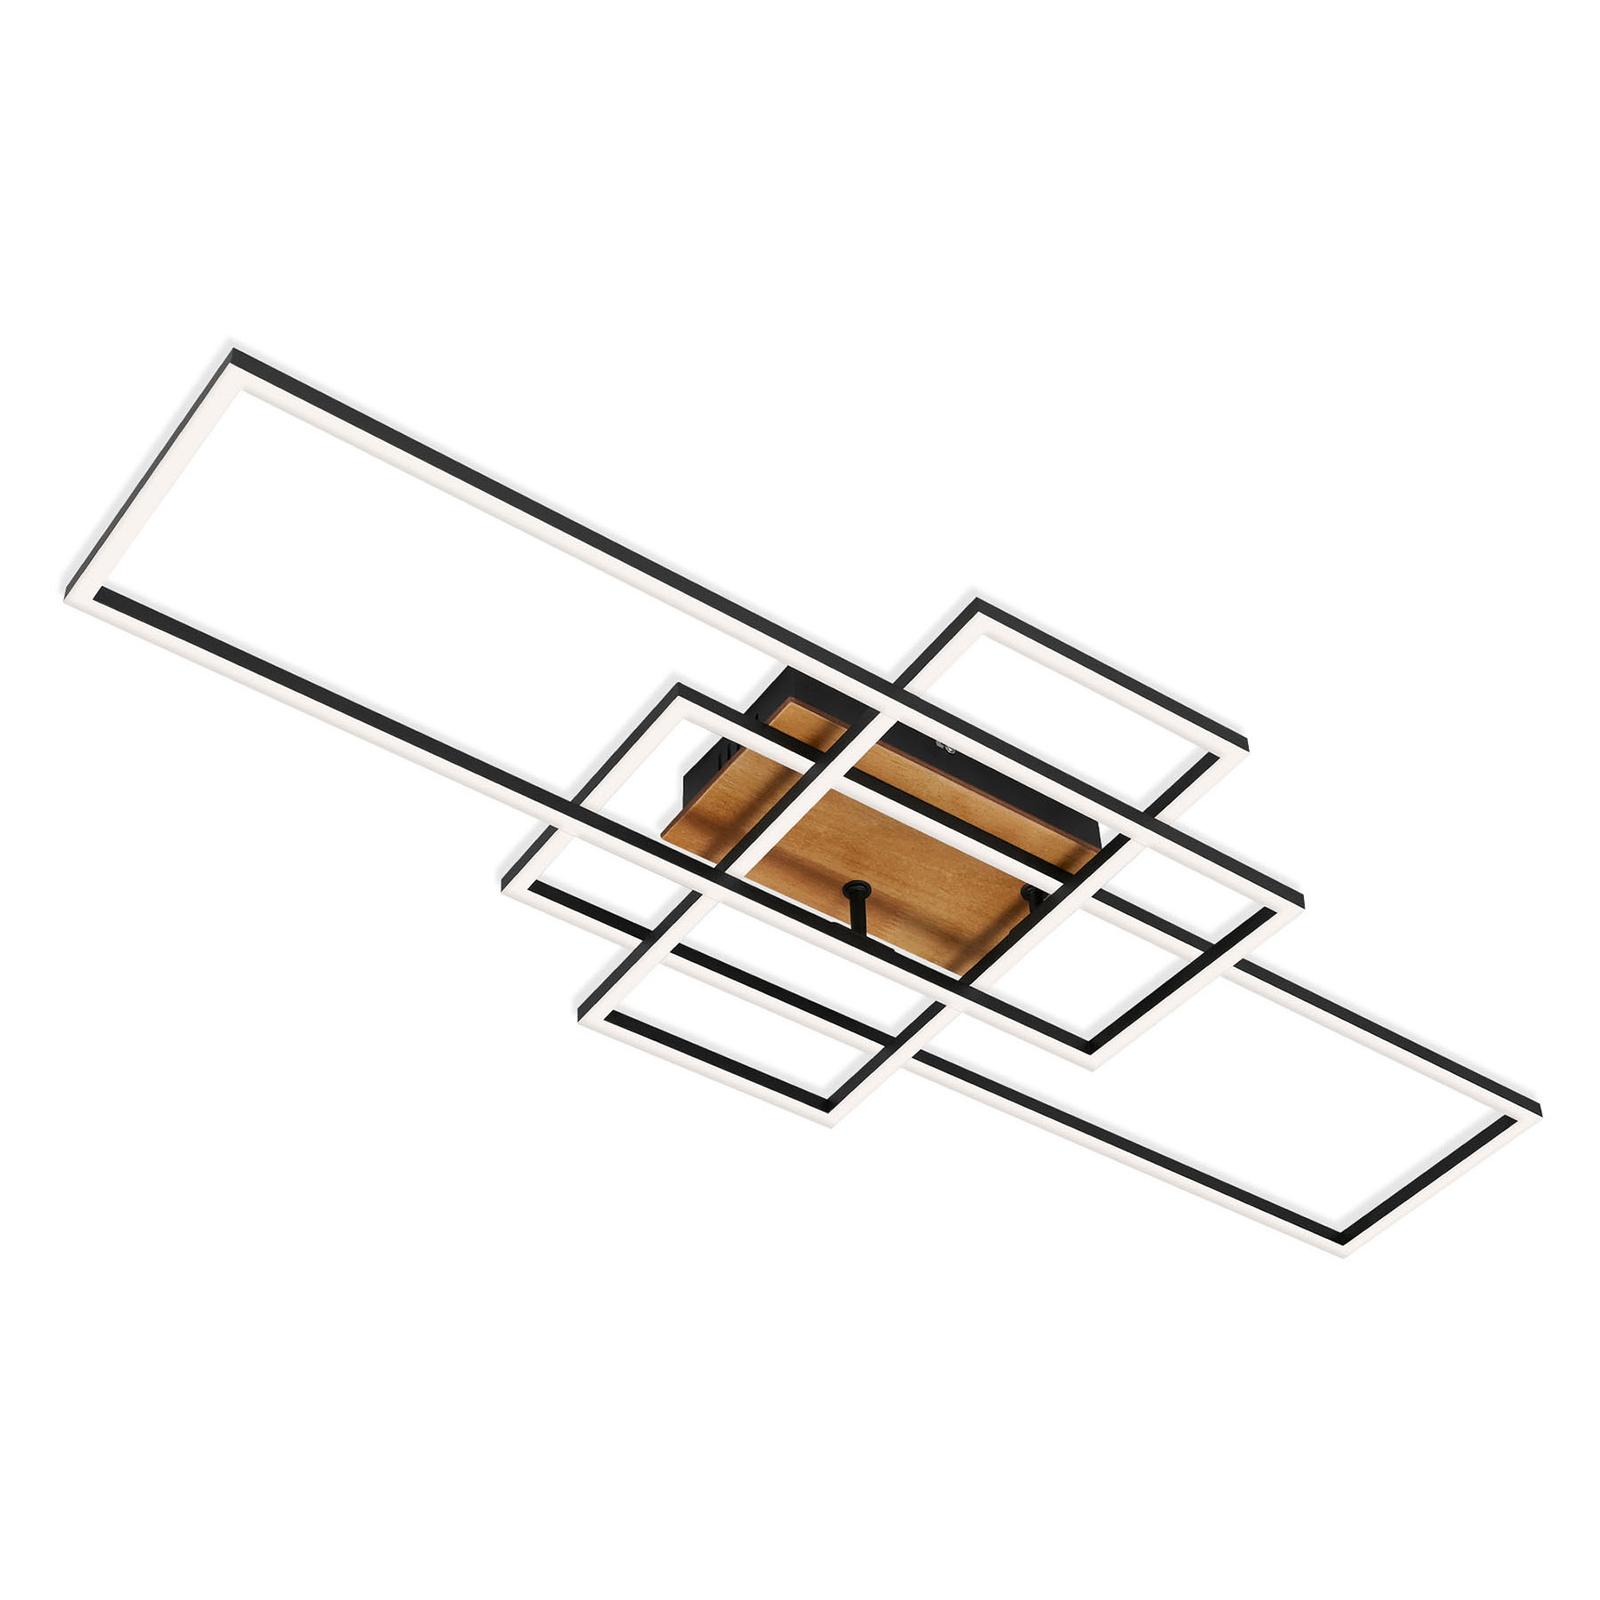 Lampa sufitowa Frame CCT, pilot, czarna/drewniana